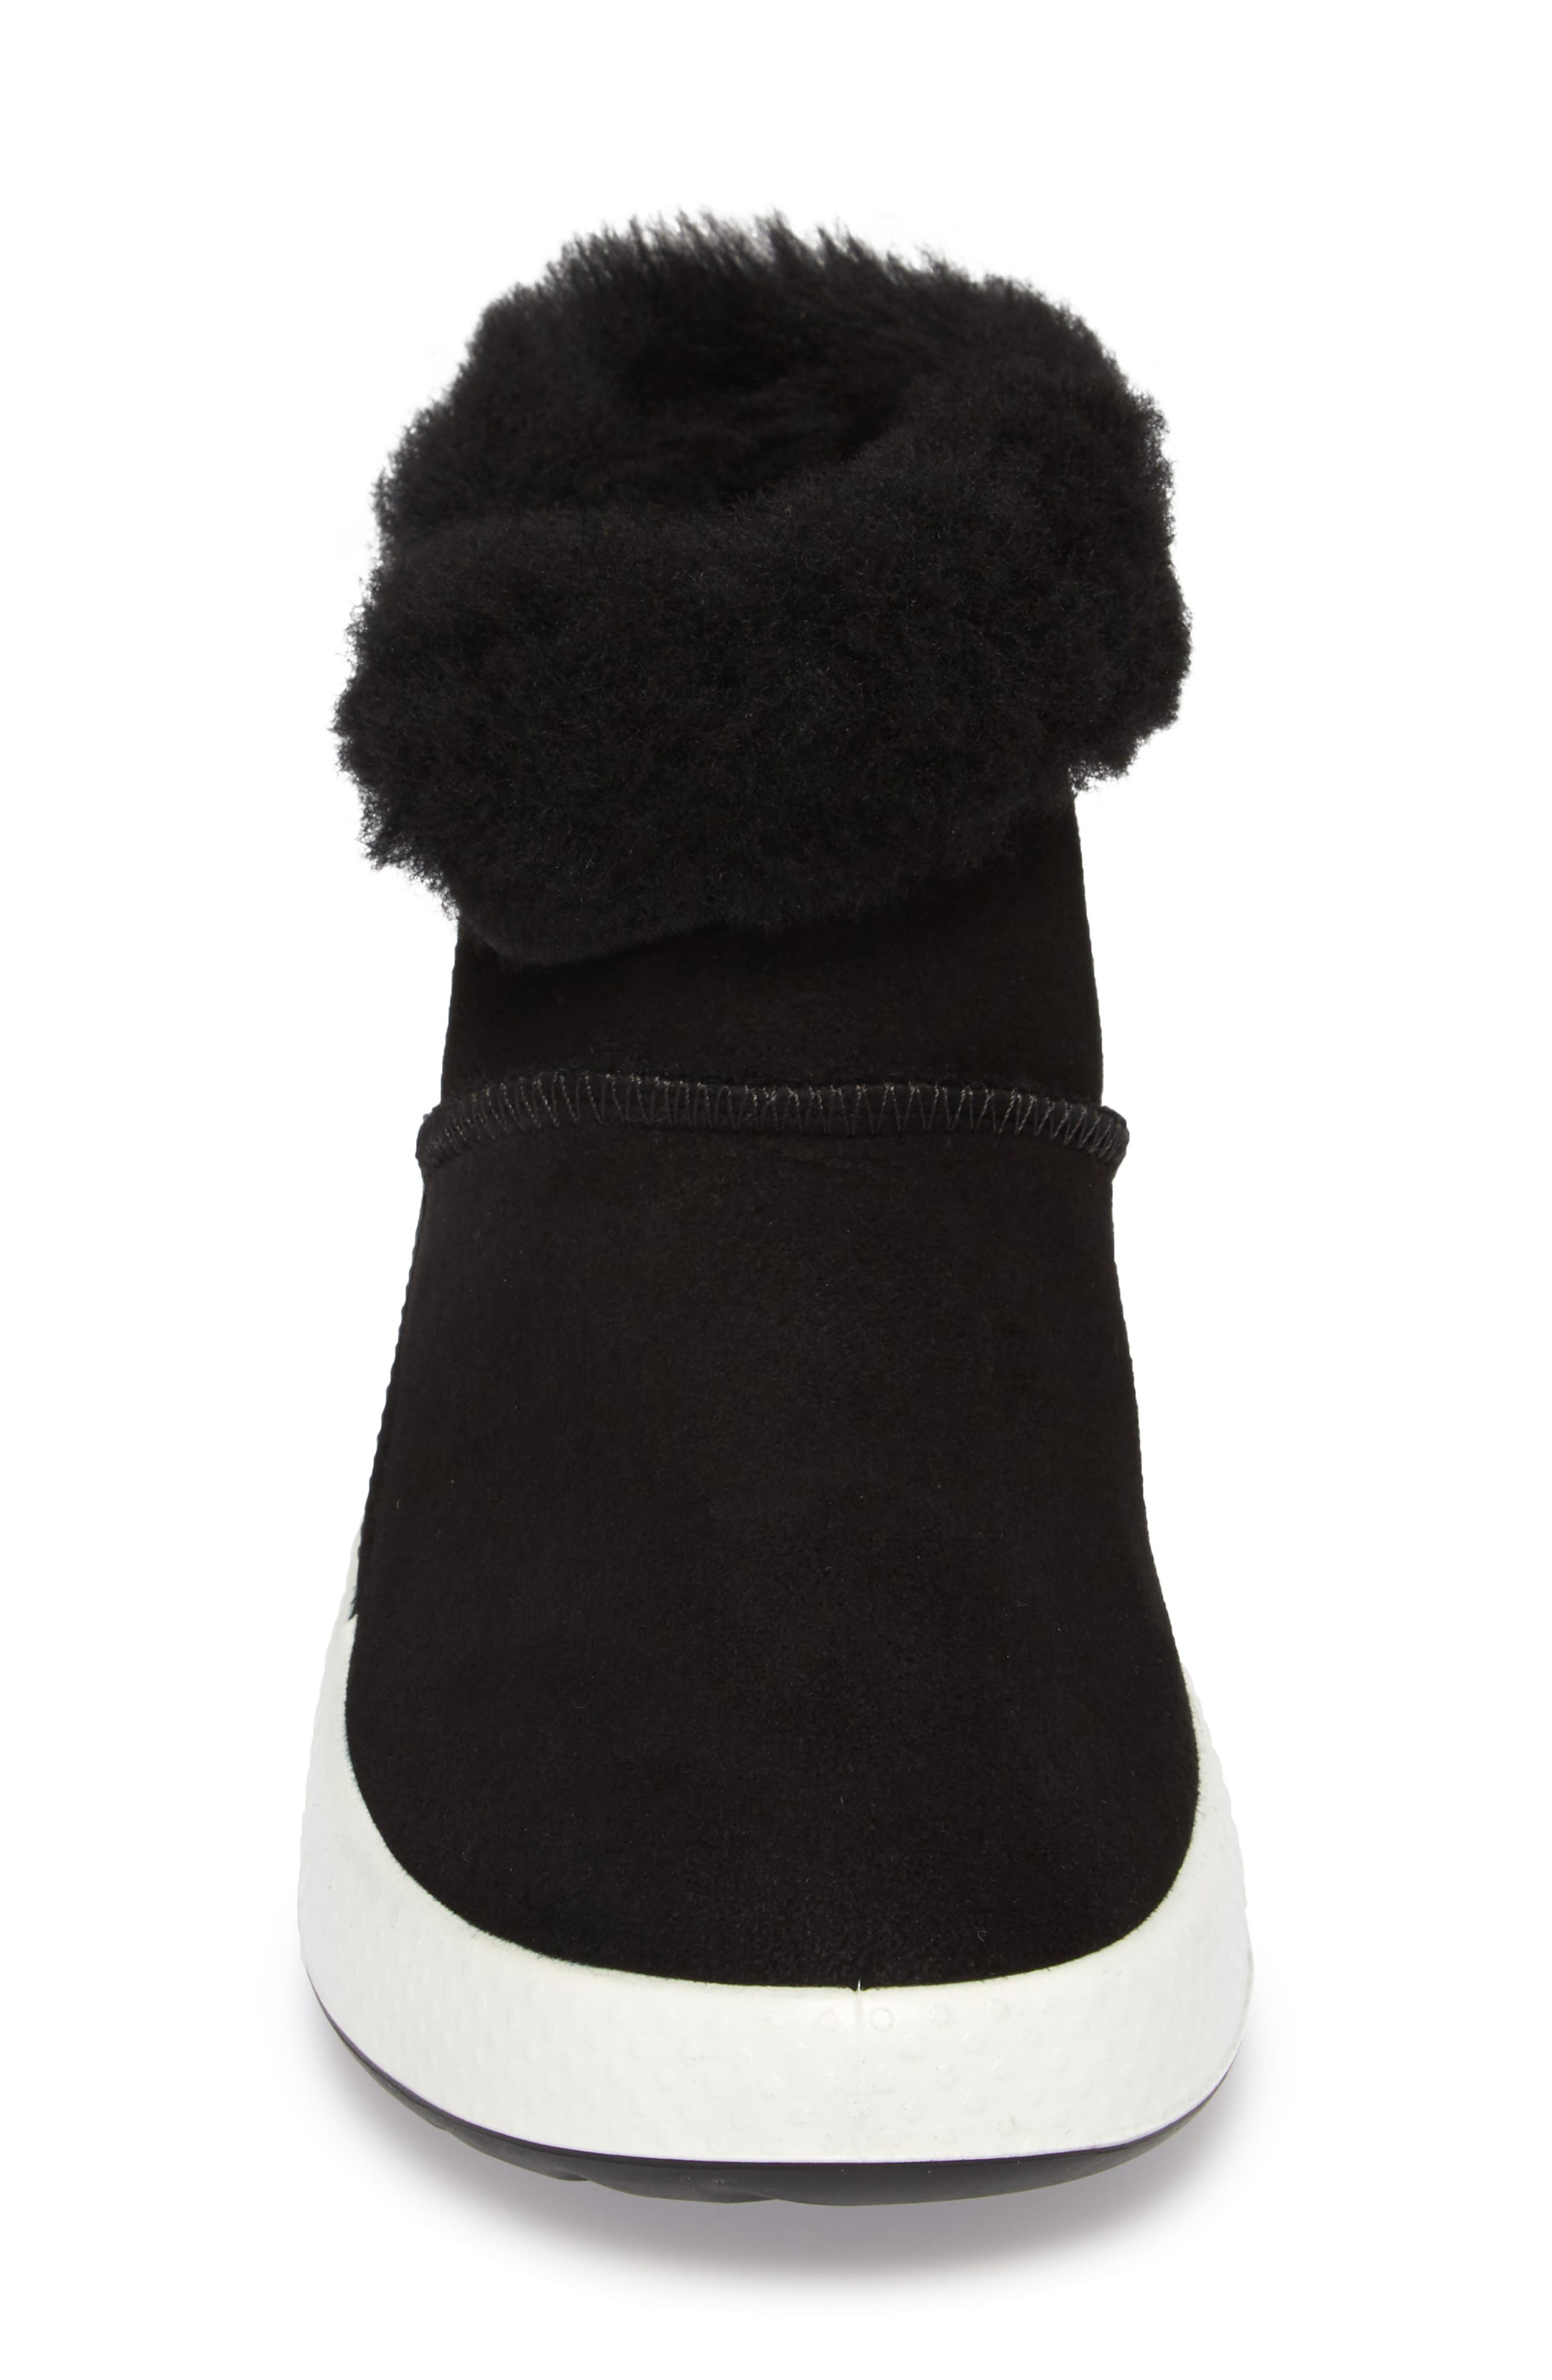 Ukiuk Genuine Shearling Boot,                             Alternate thumbnail 4, color,                             Black Leather